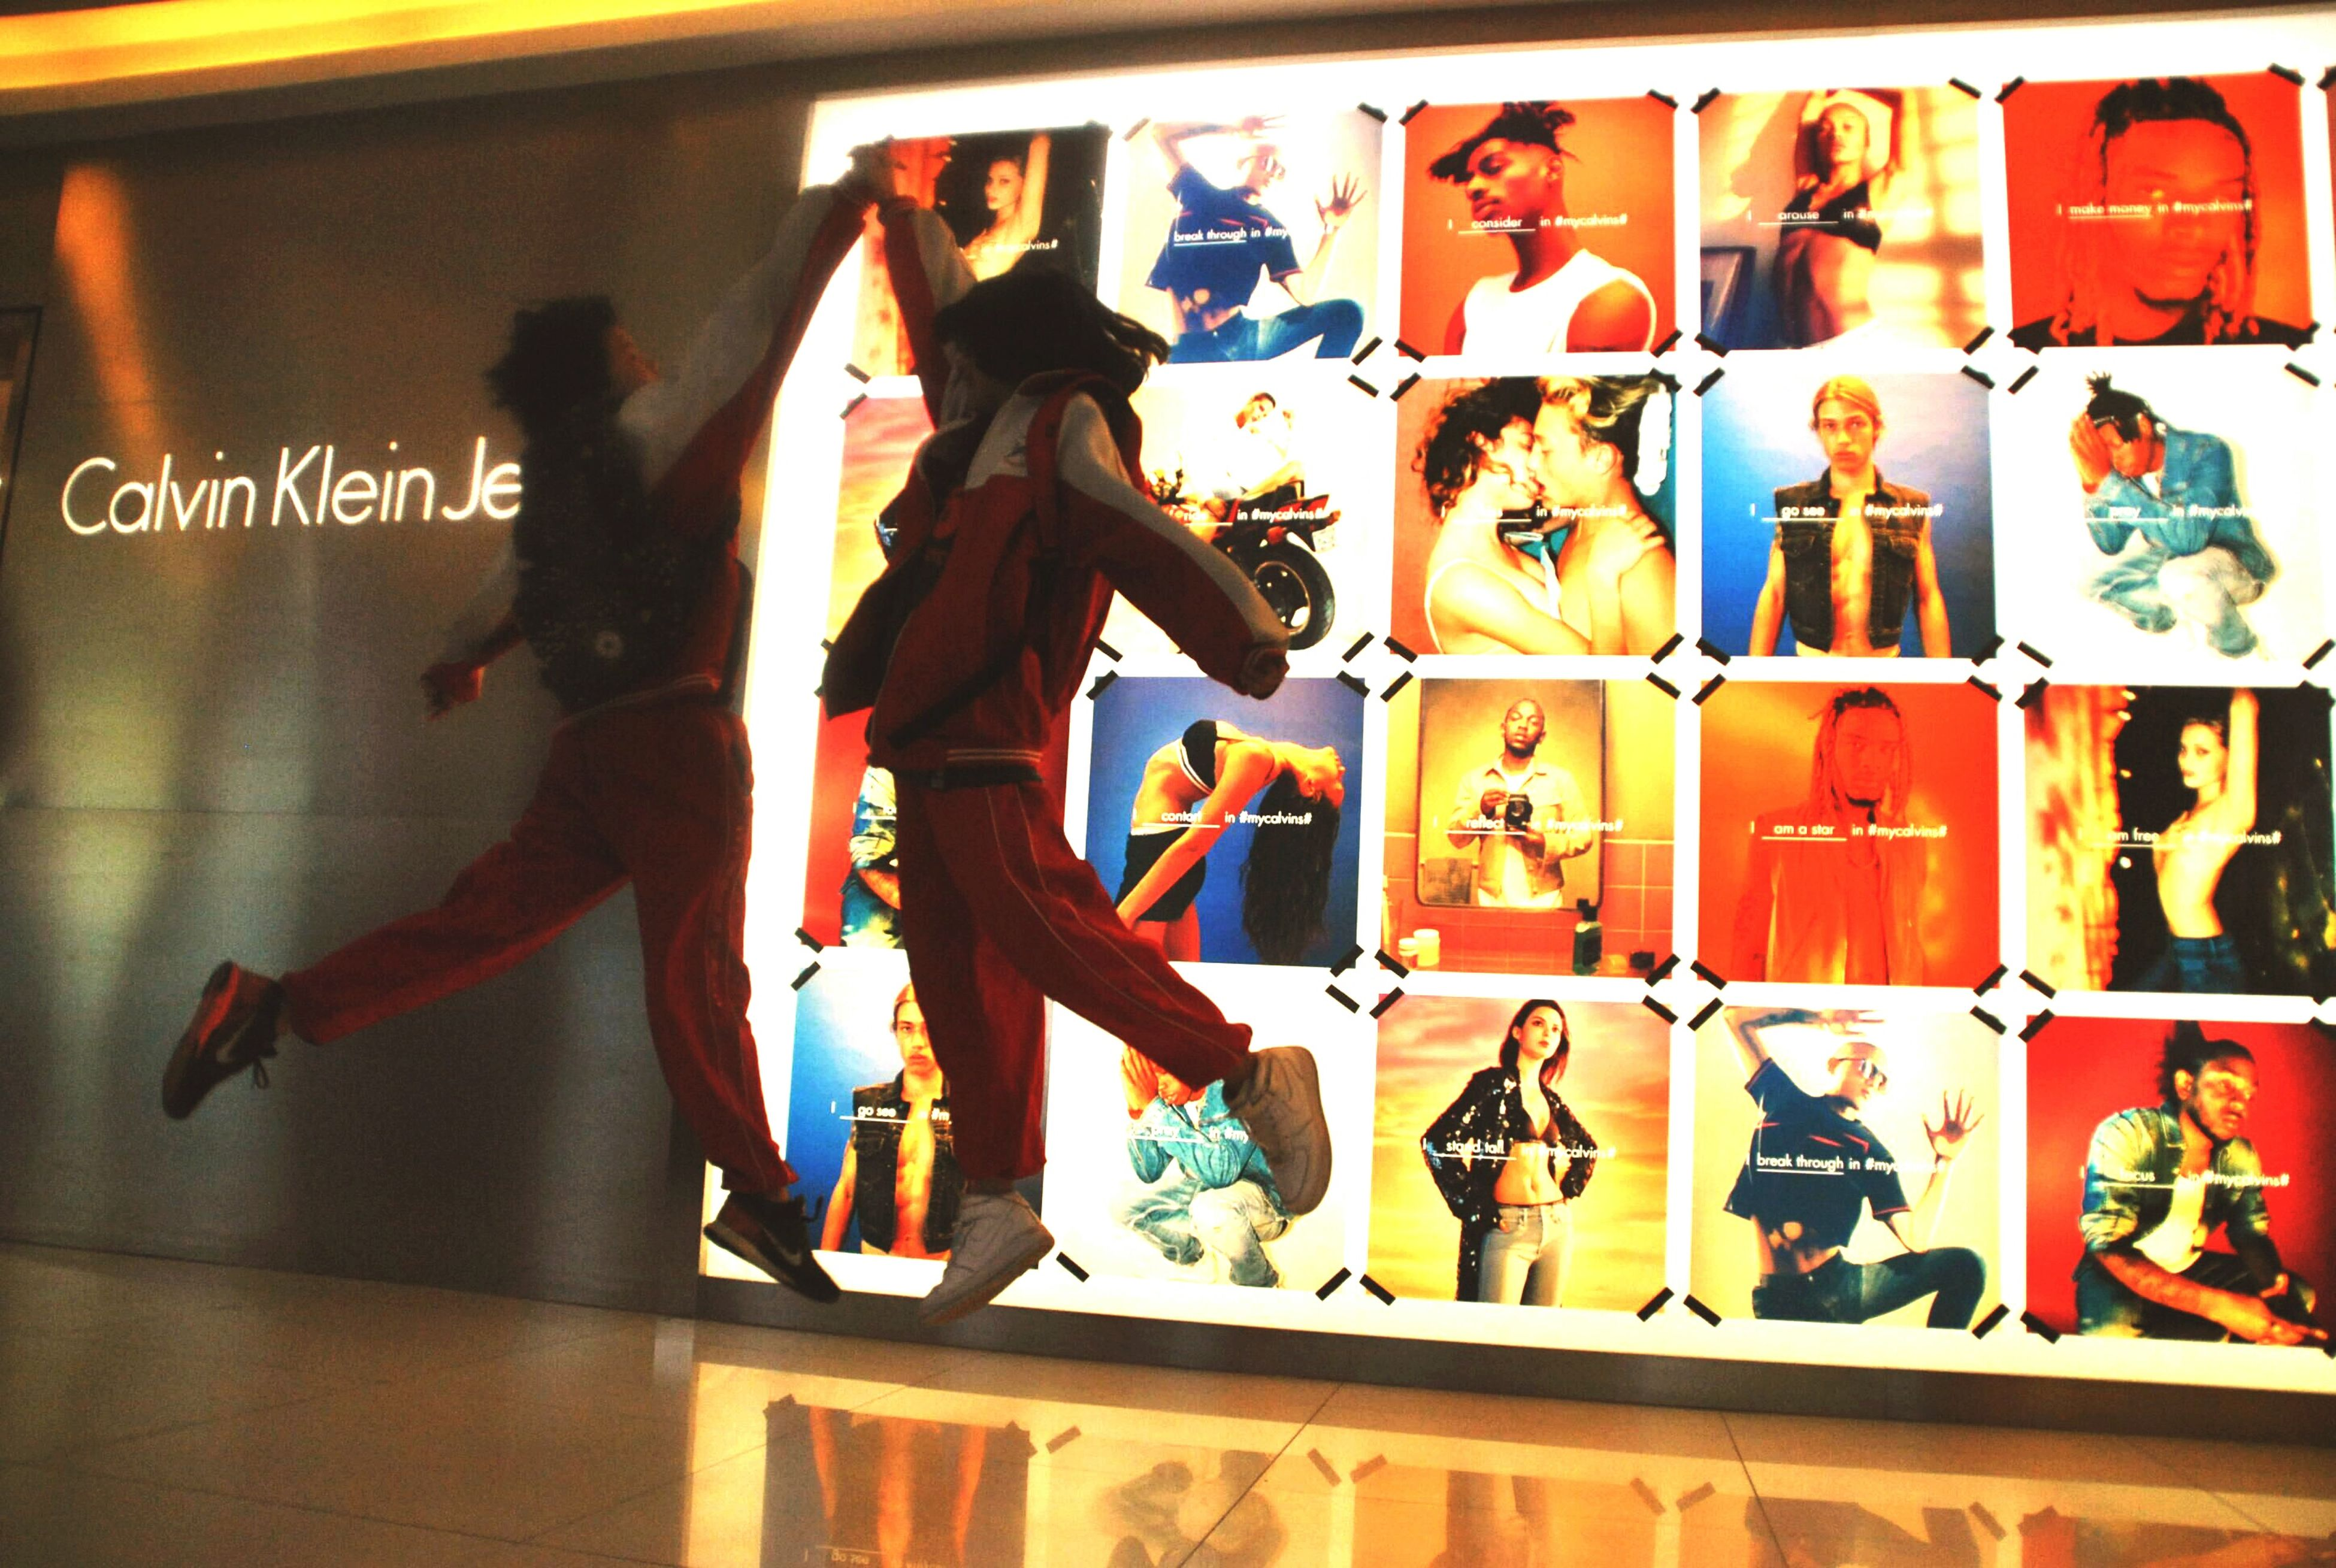 indoors, lifestyles, text, men, communication, leisure activity, human representation, western script, full length, person, animal representation, art, non-western script, standing, creativity, architecture, art and craft, built structure